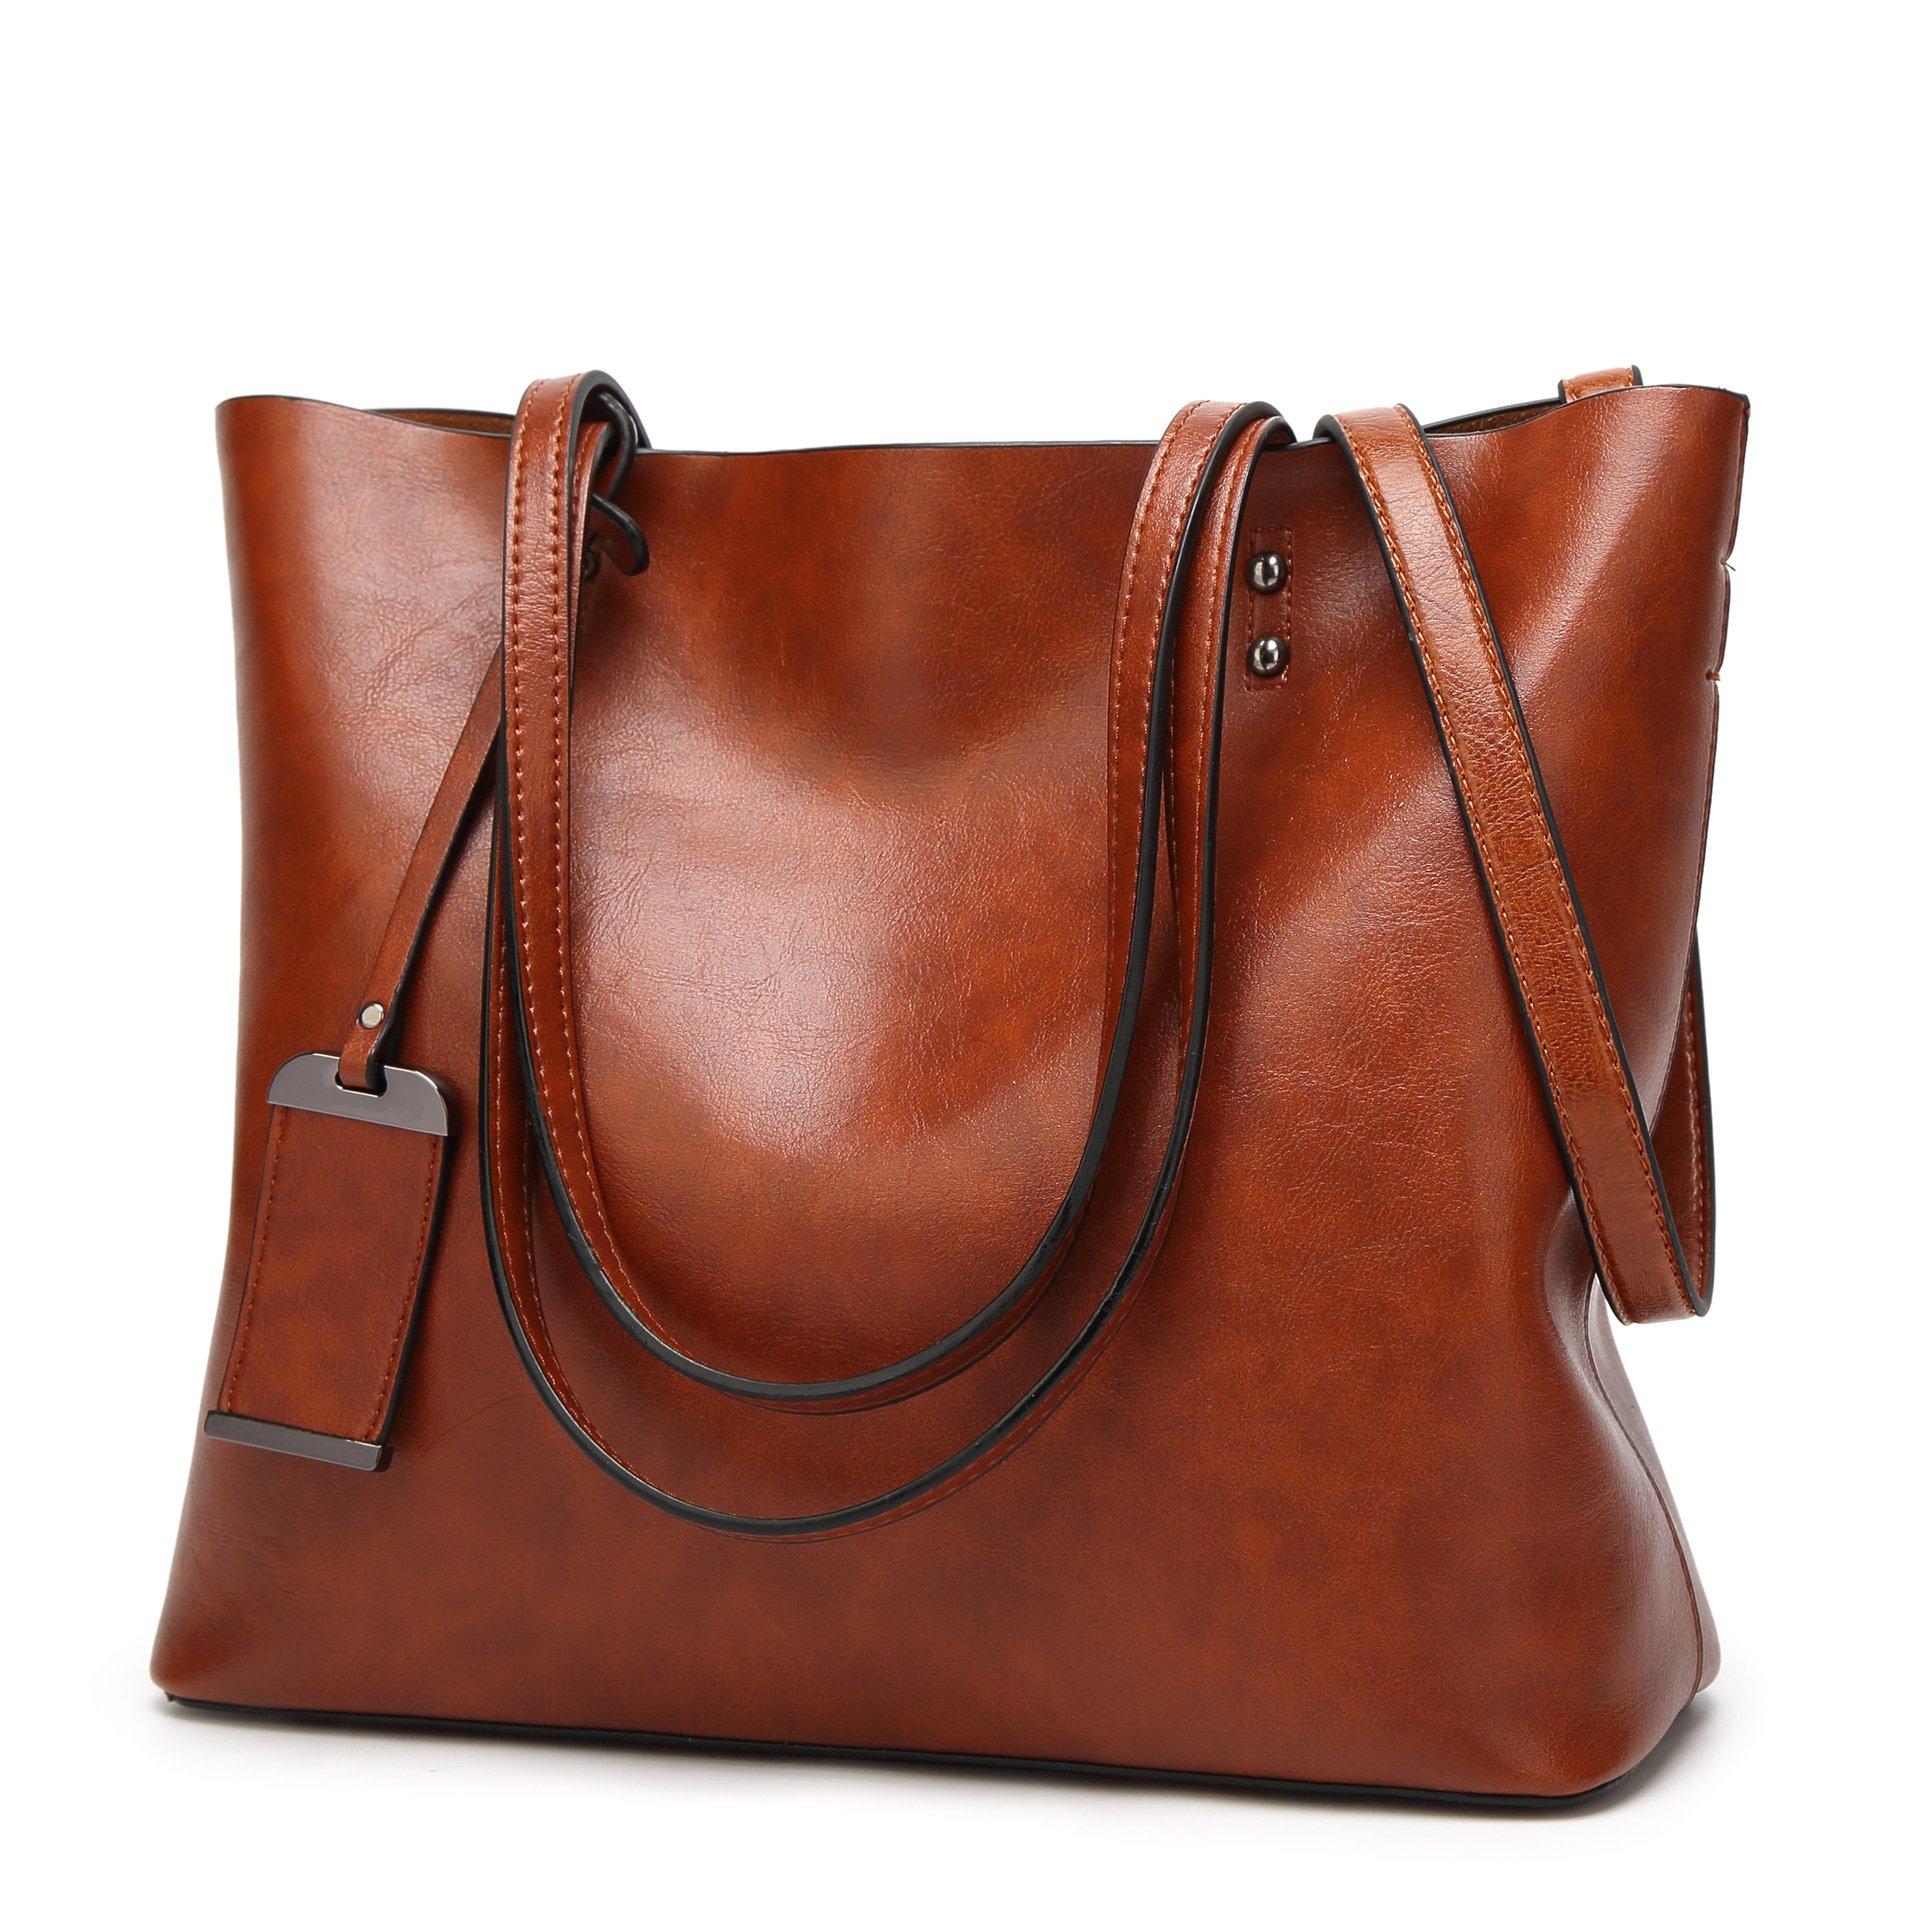 Obosoyo Women Shoulder Tote Satchel Bag Lady Messenger Purse Top Handle Hobo Handbags Brown